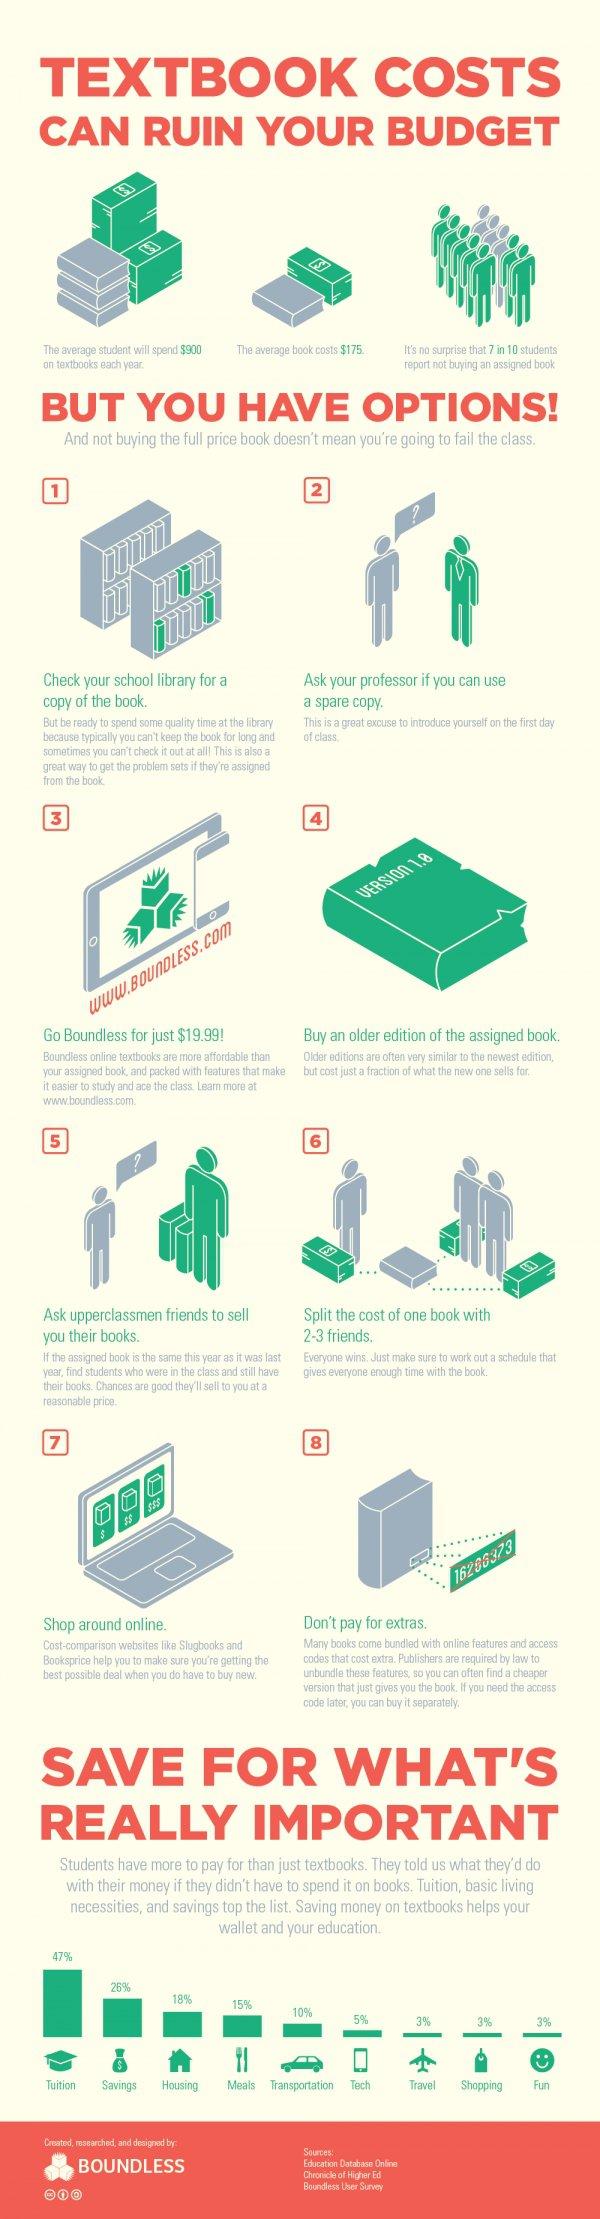 8 Ways to save Money on Textbooks